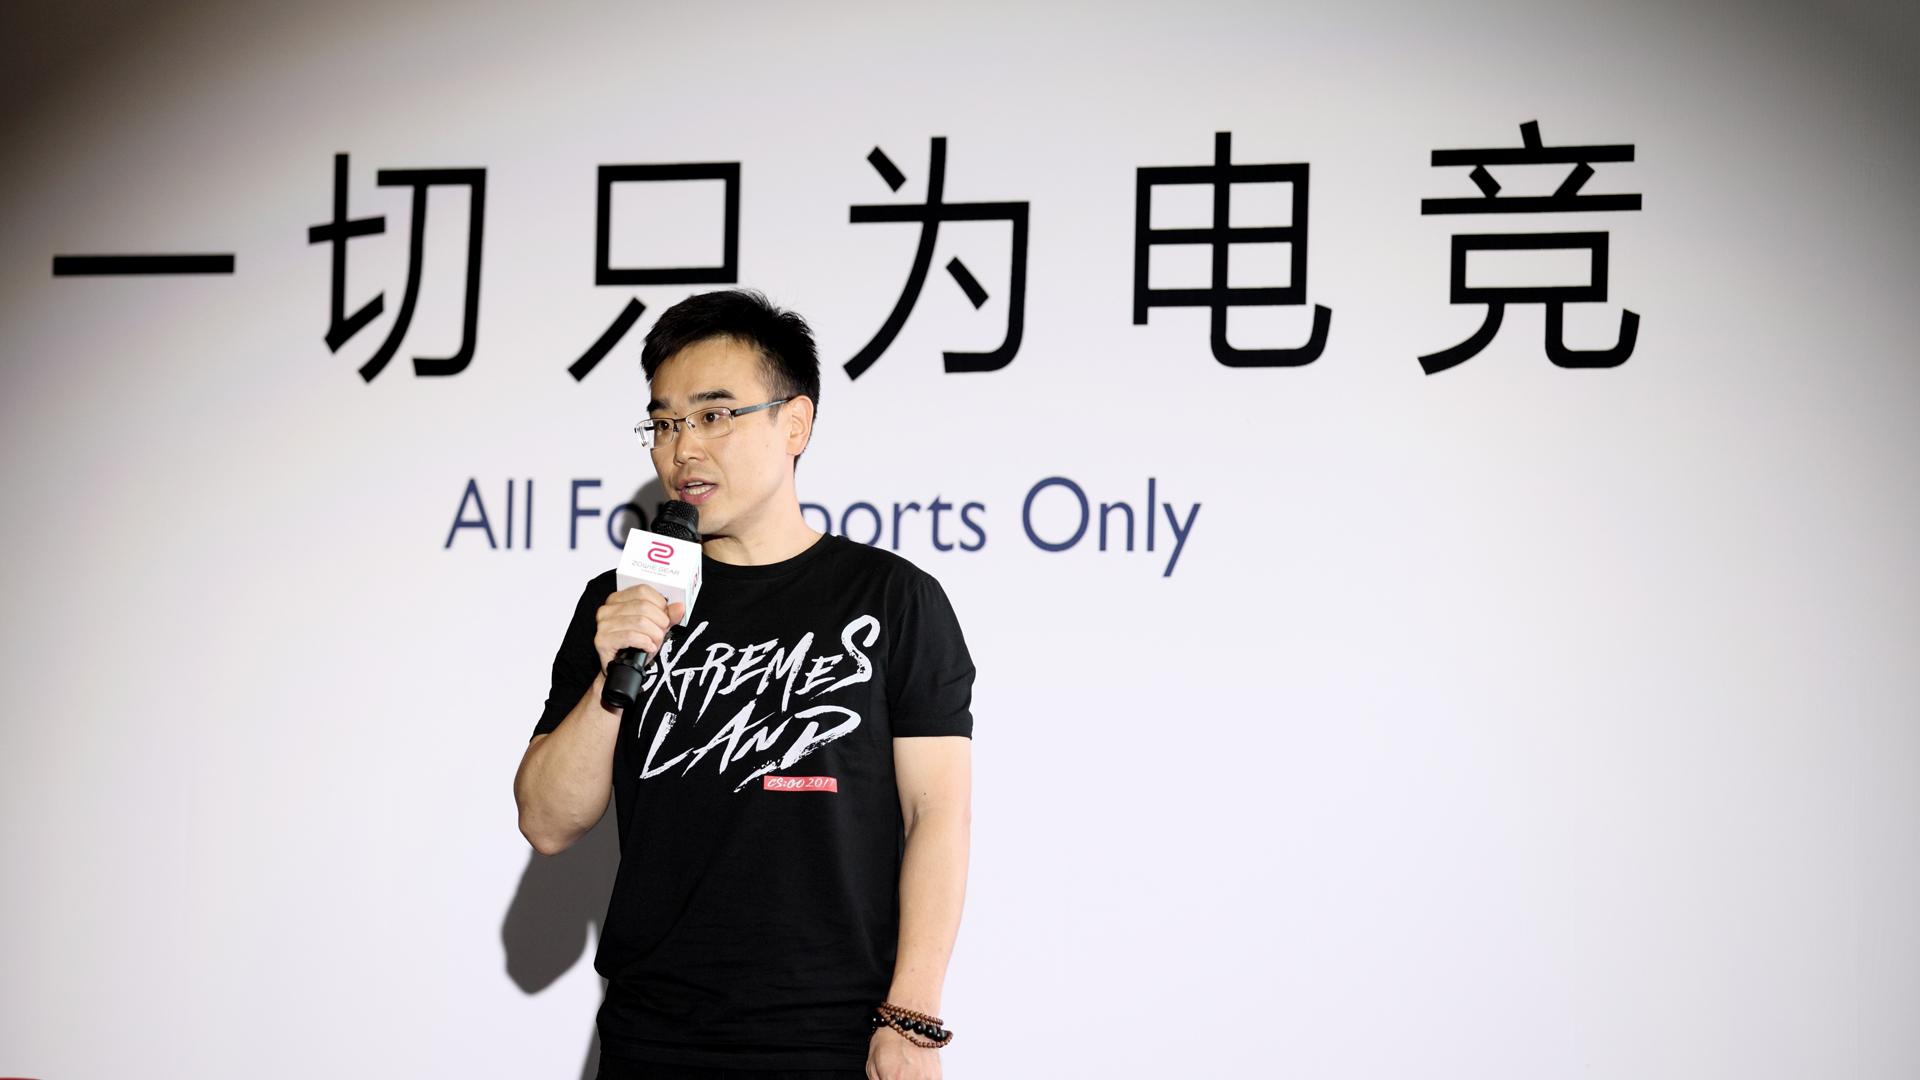 ZOWIE GEAR 电竞新品年度发布 - 米多饭香